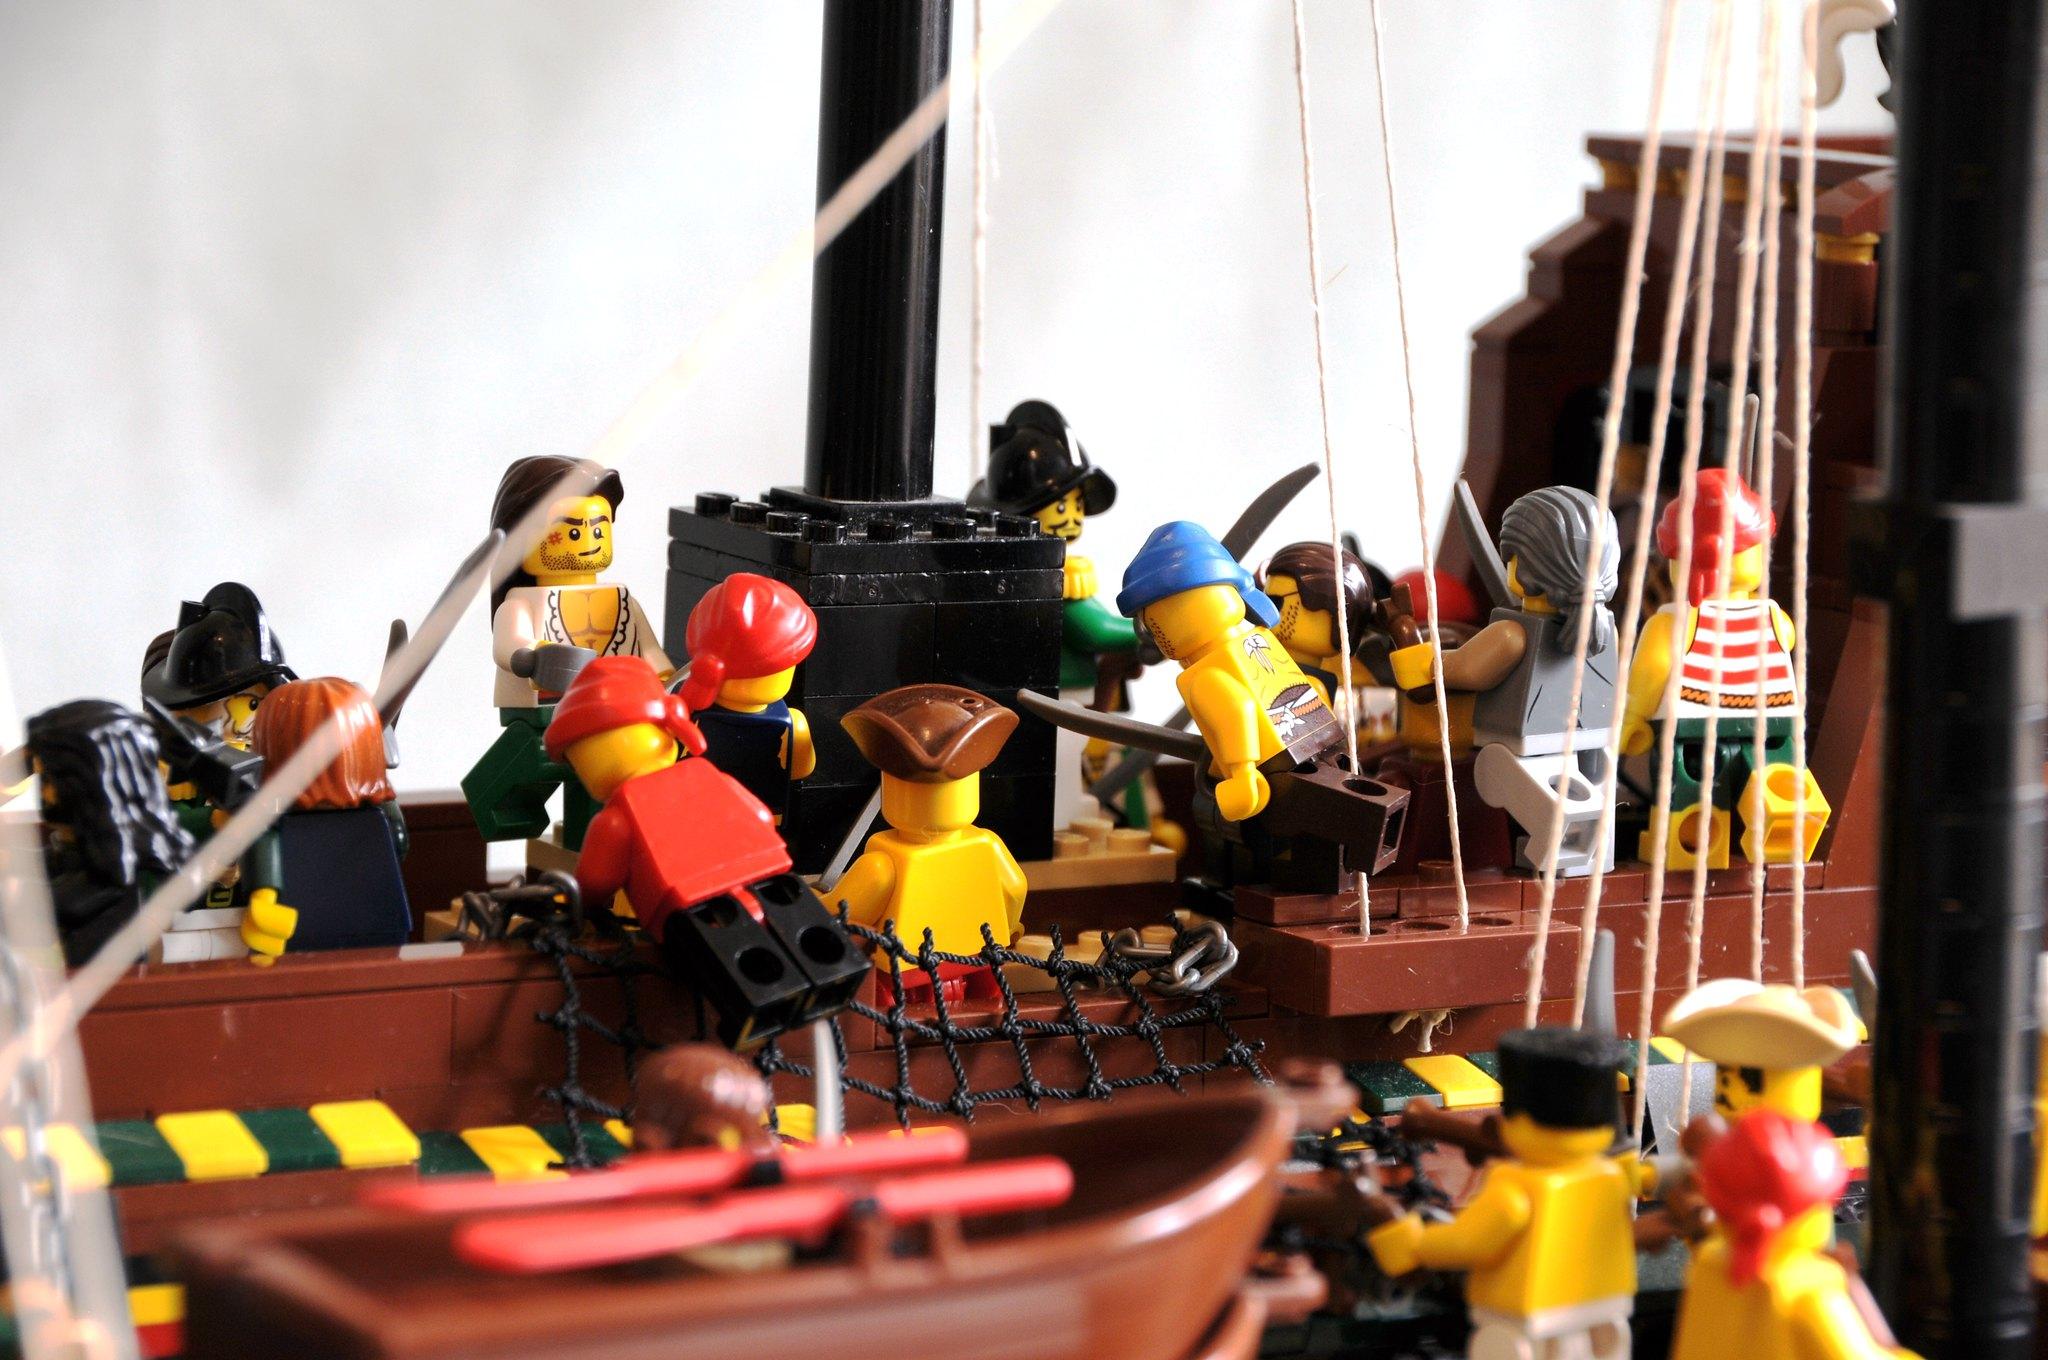 Taking the treasure galleon - melee